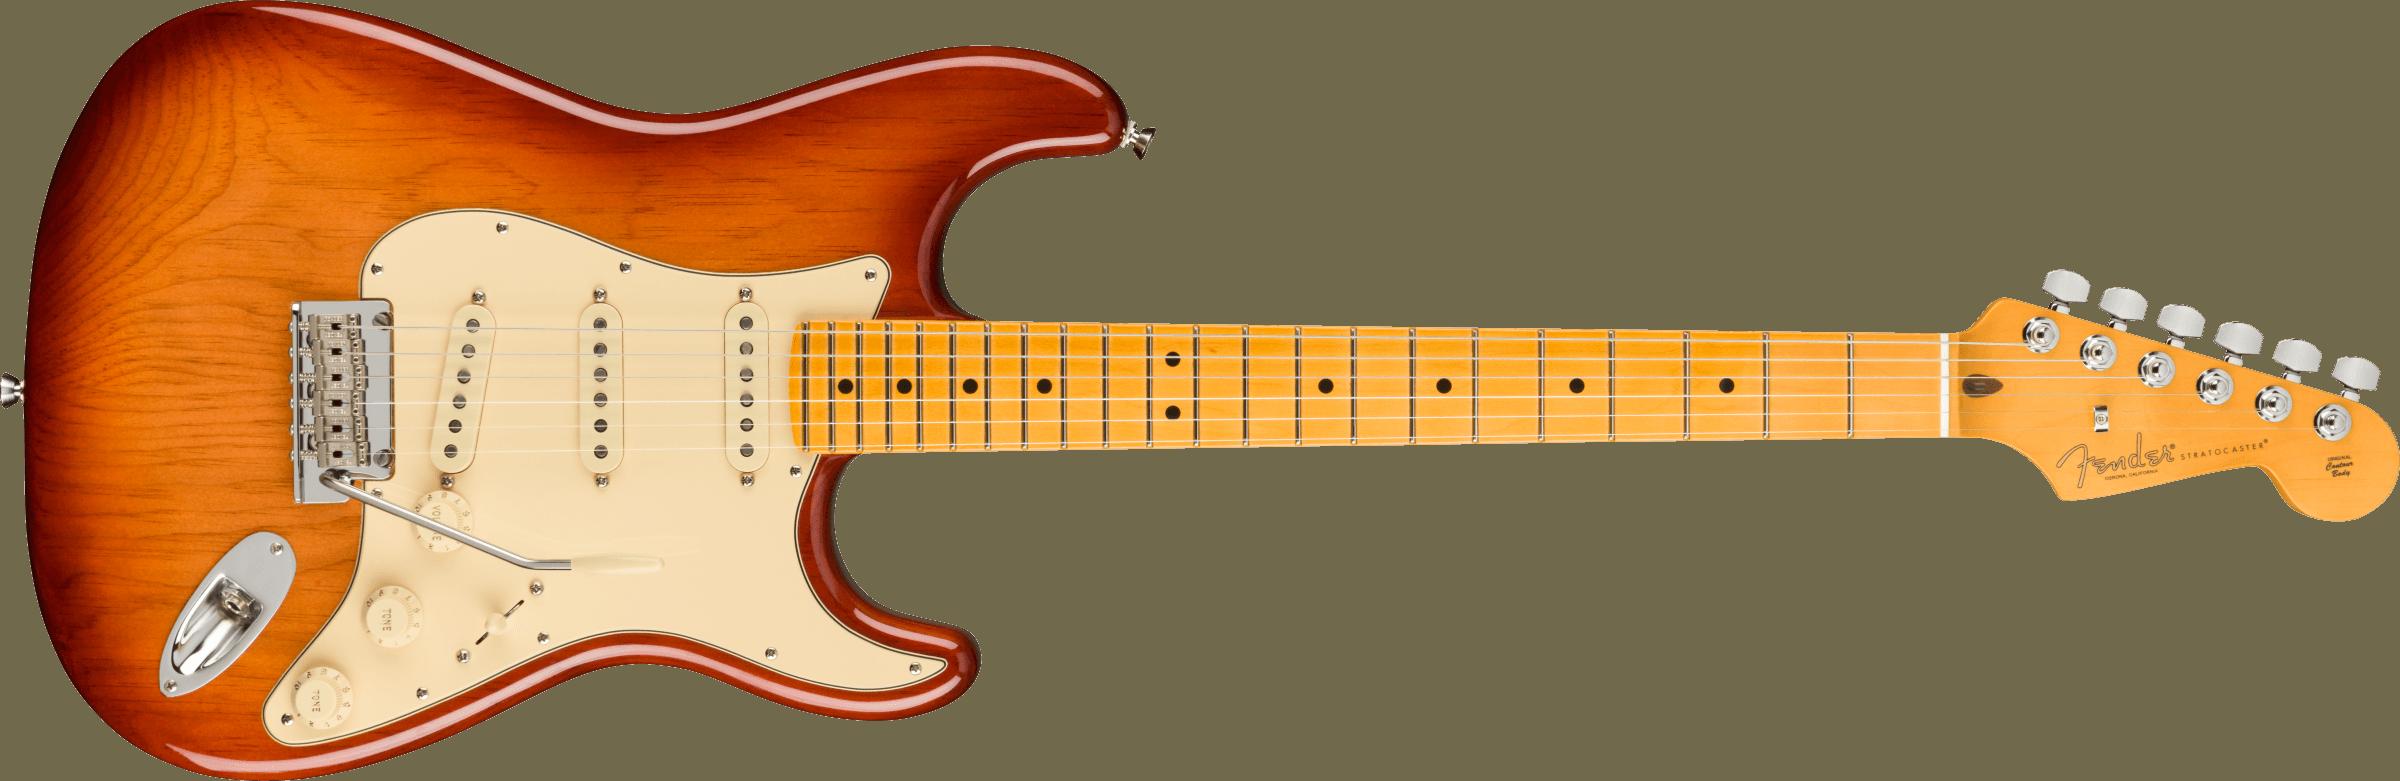 Fender American Professional II Stratocaster®, Maple Fingerboard, Sienna Sunburst